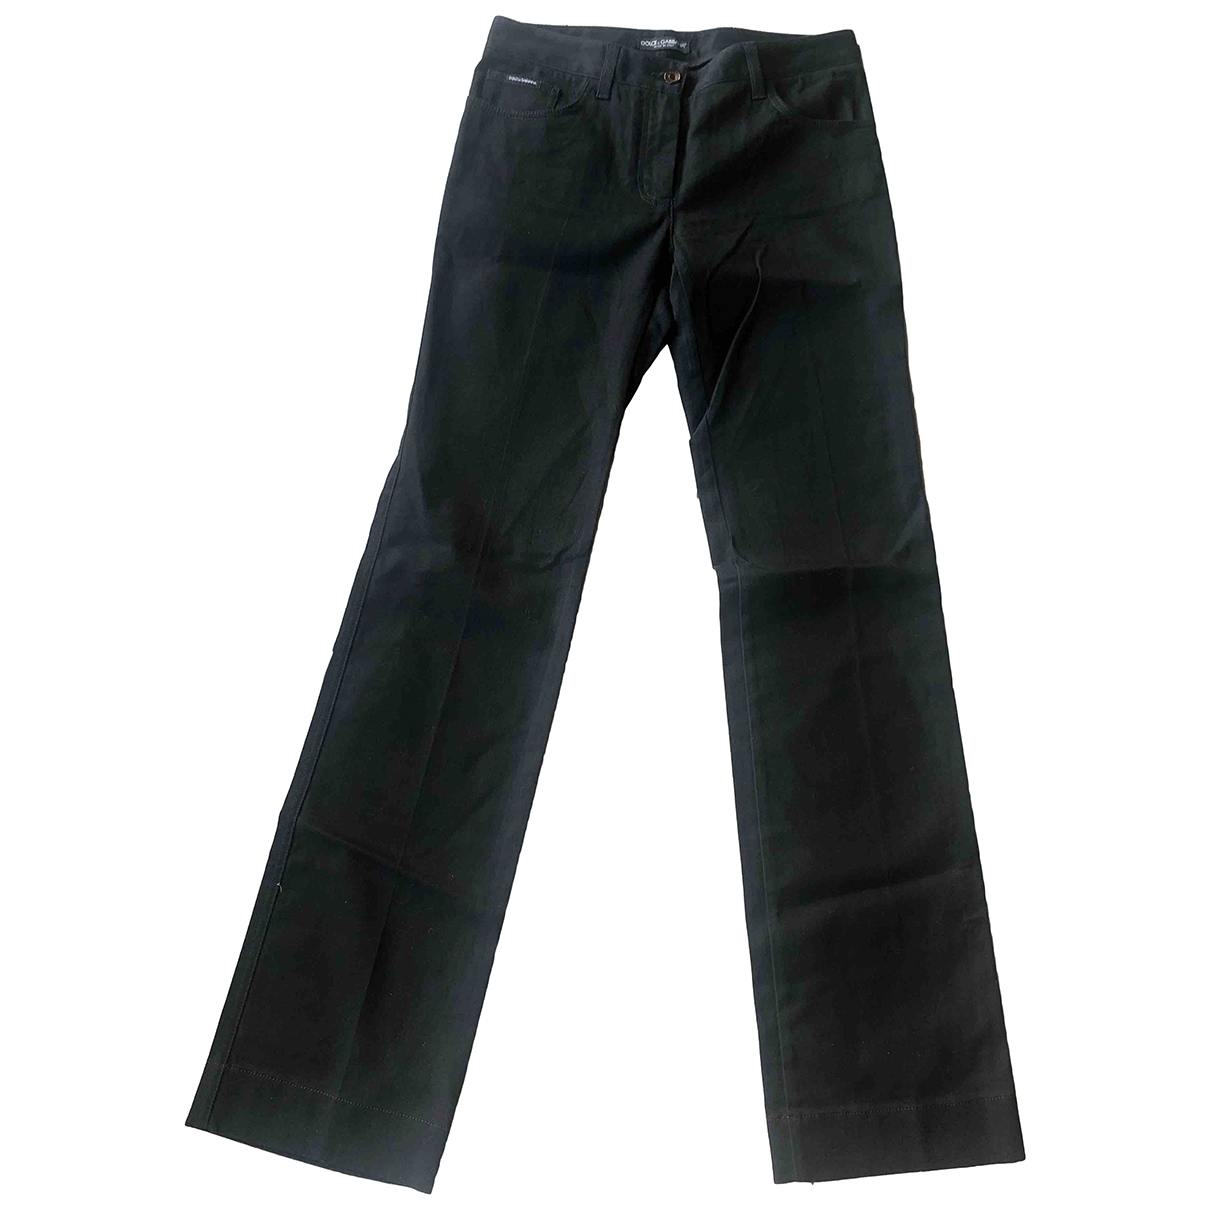 Dolce & Gabbana \N Black Cotton - elasthane Jeans for Women 30 US